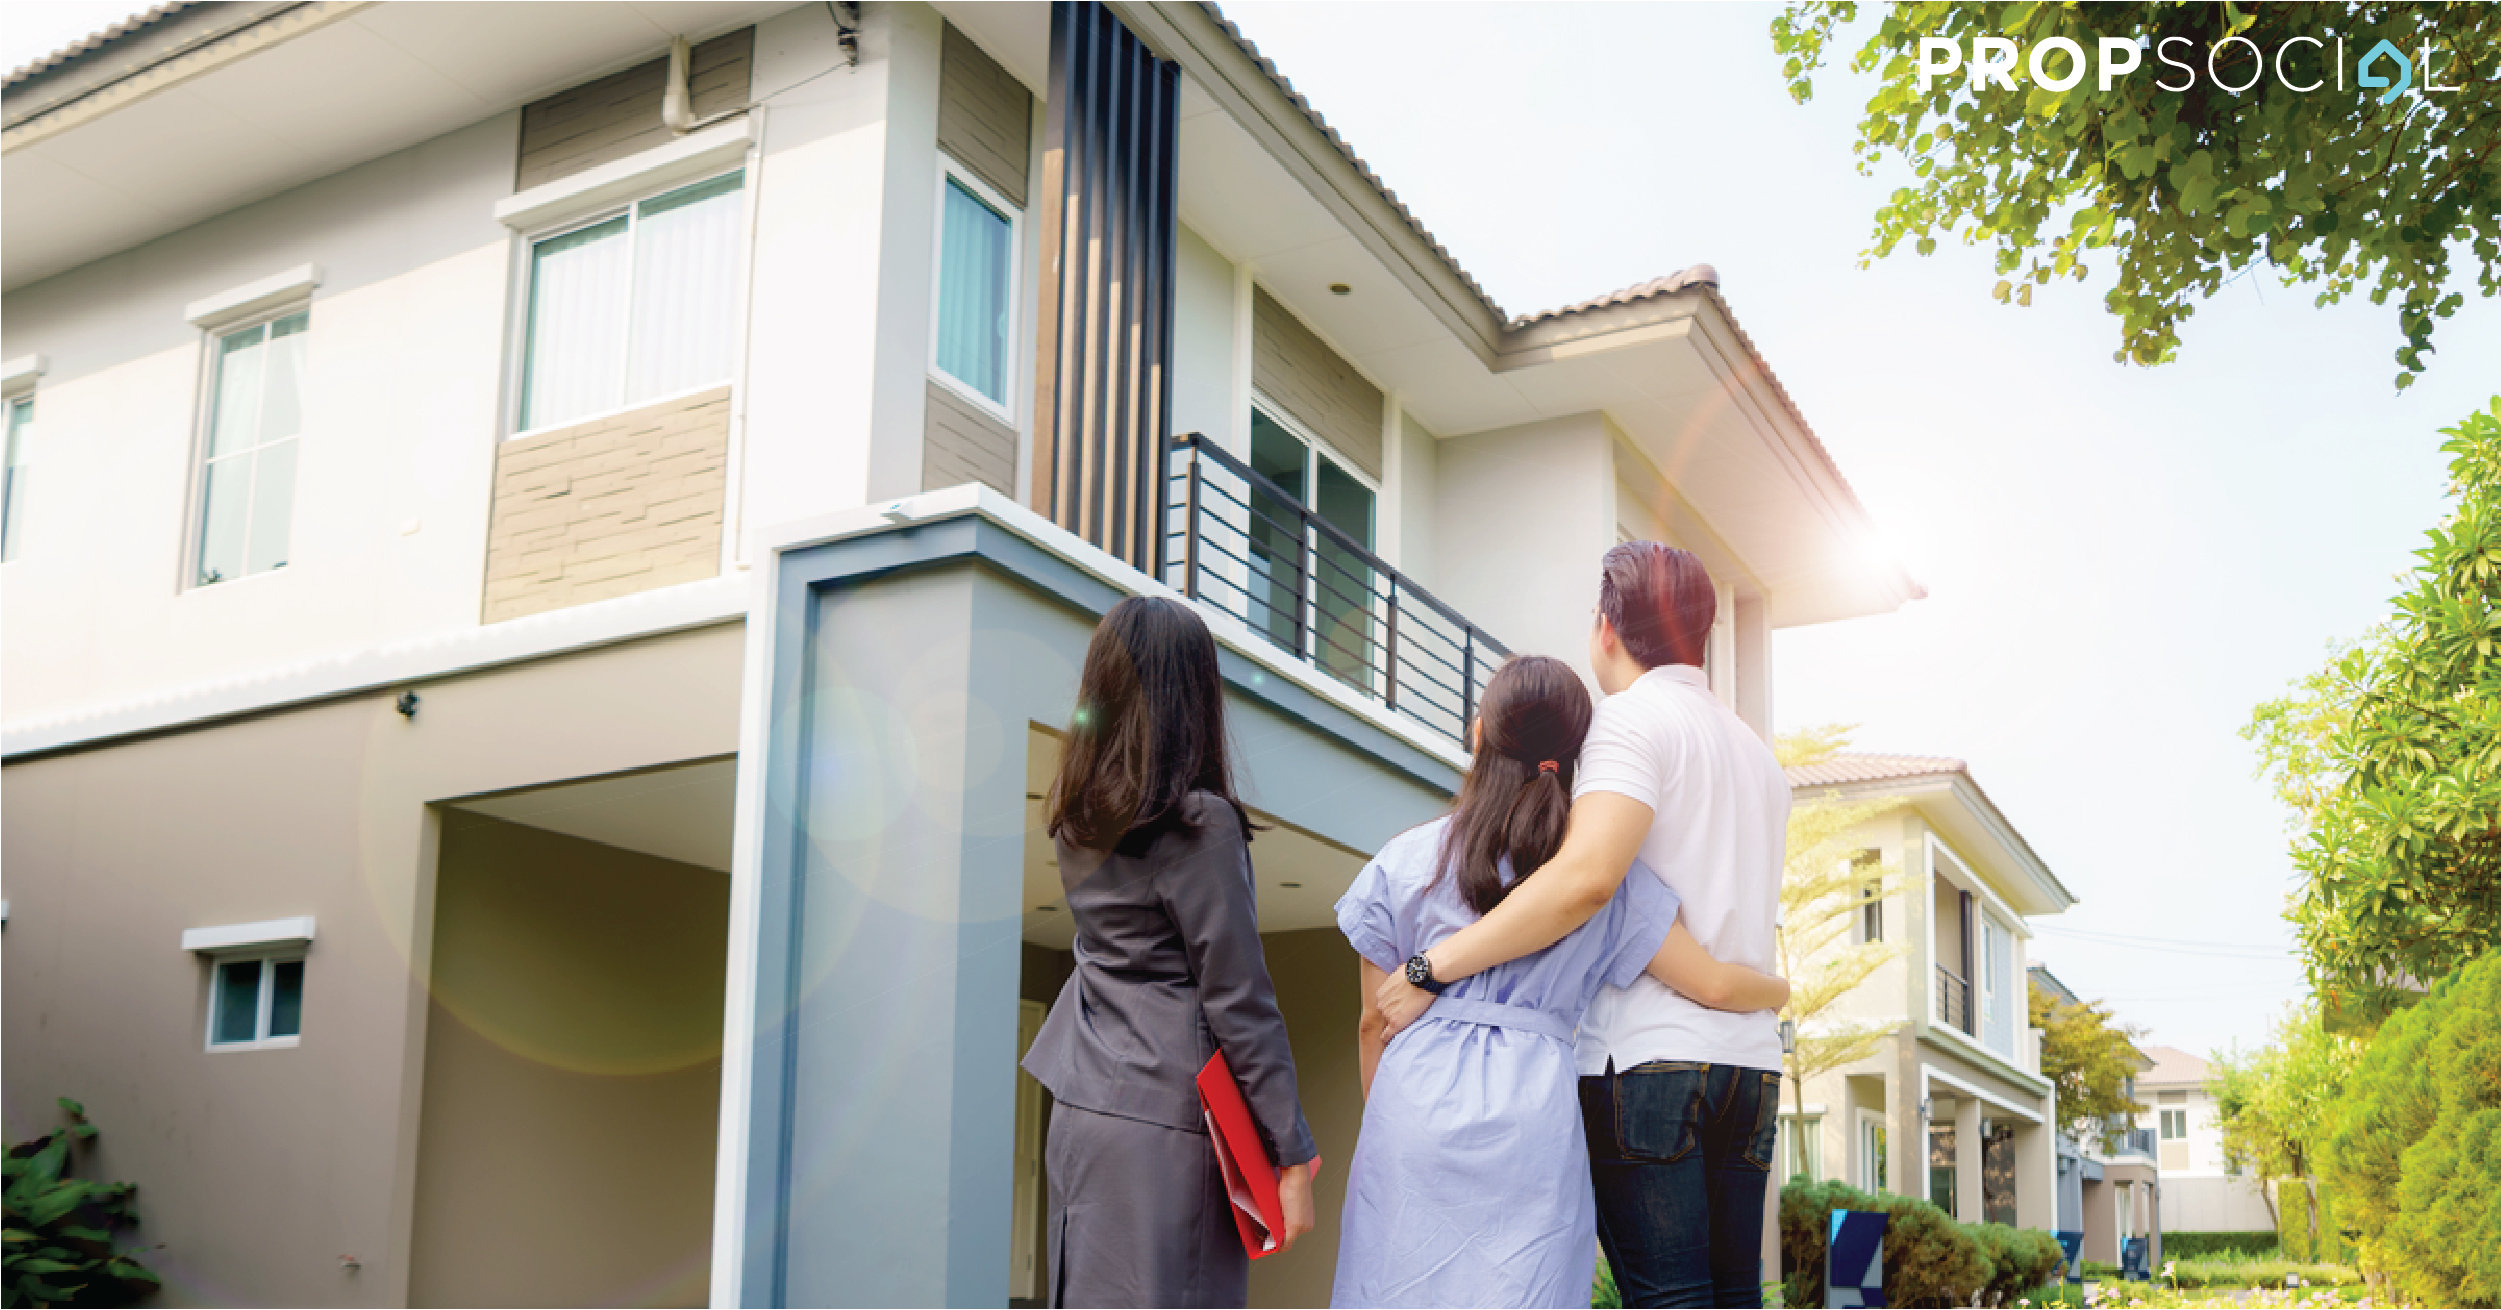 Home covid v2 1200x628